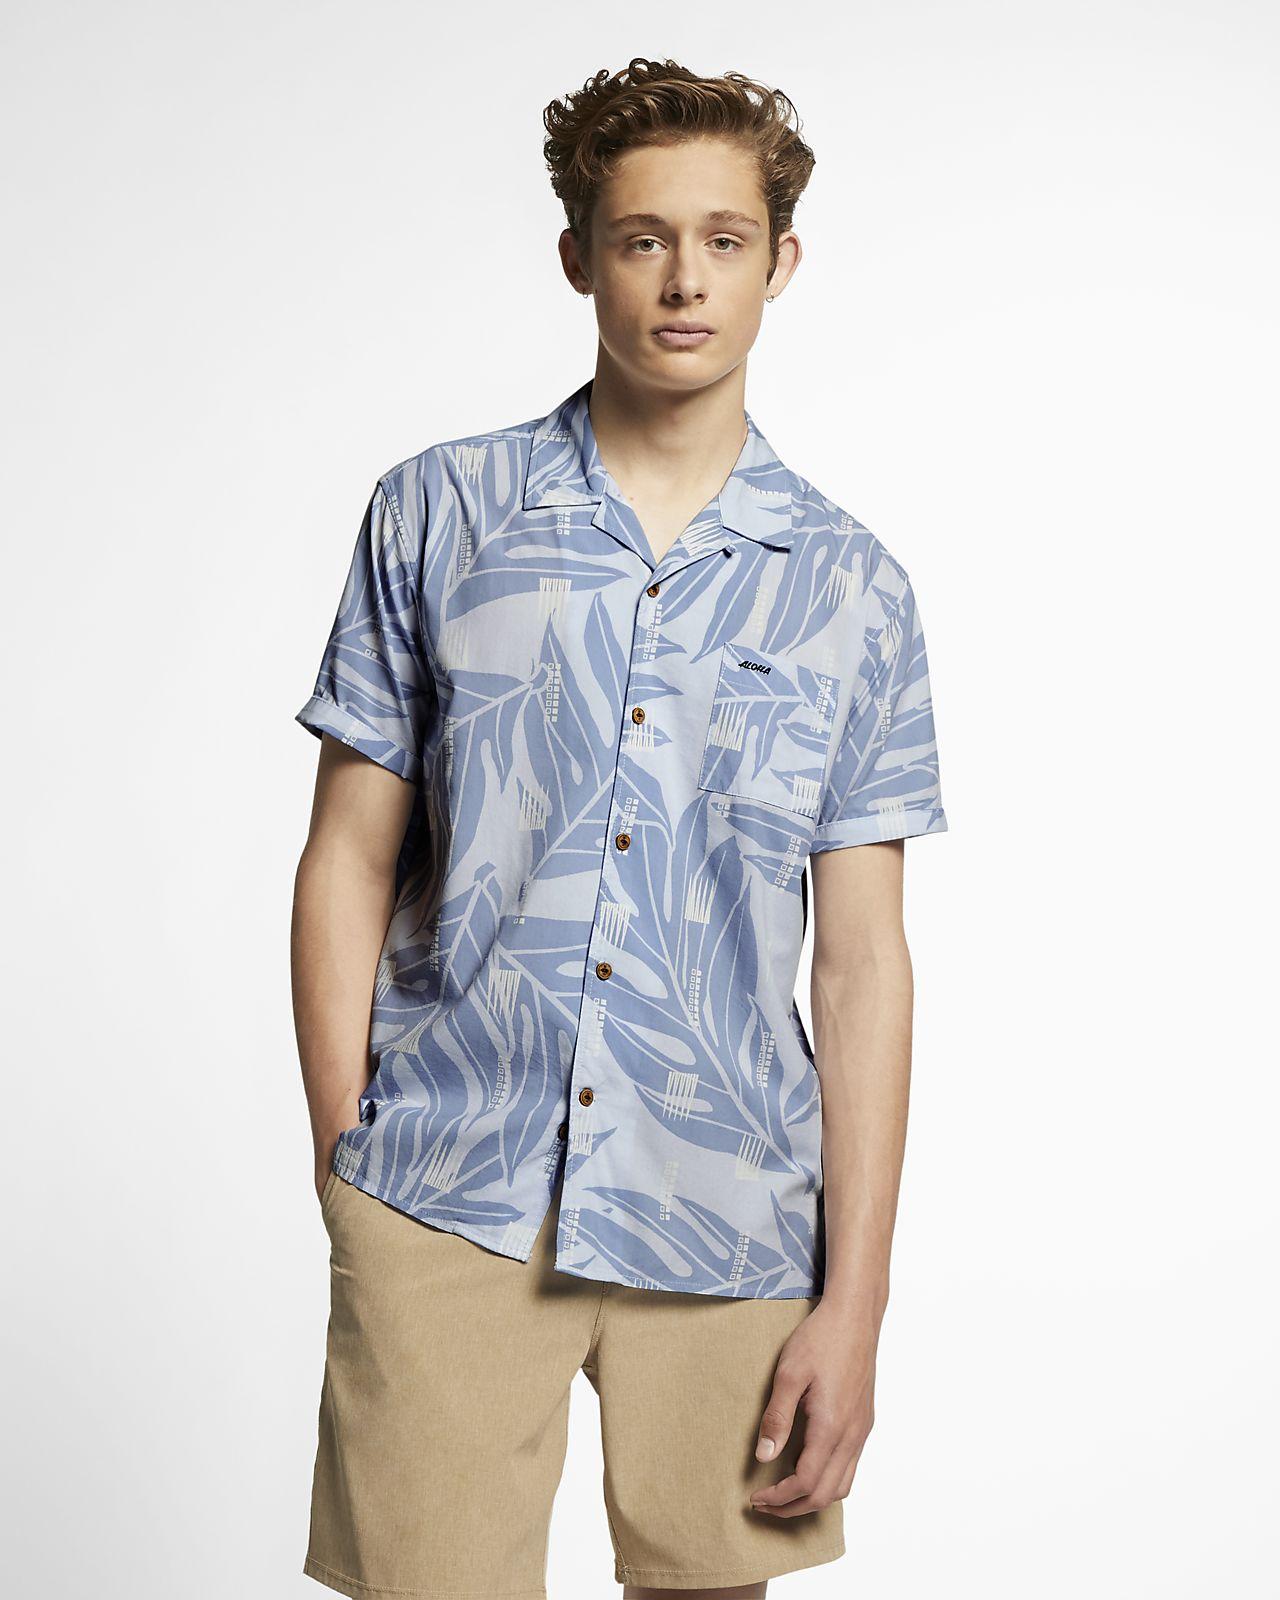 Chemise à manches courtes Hurley Sig Zane Maloulu pour Homme